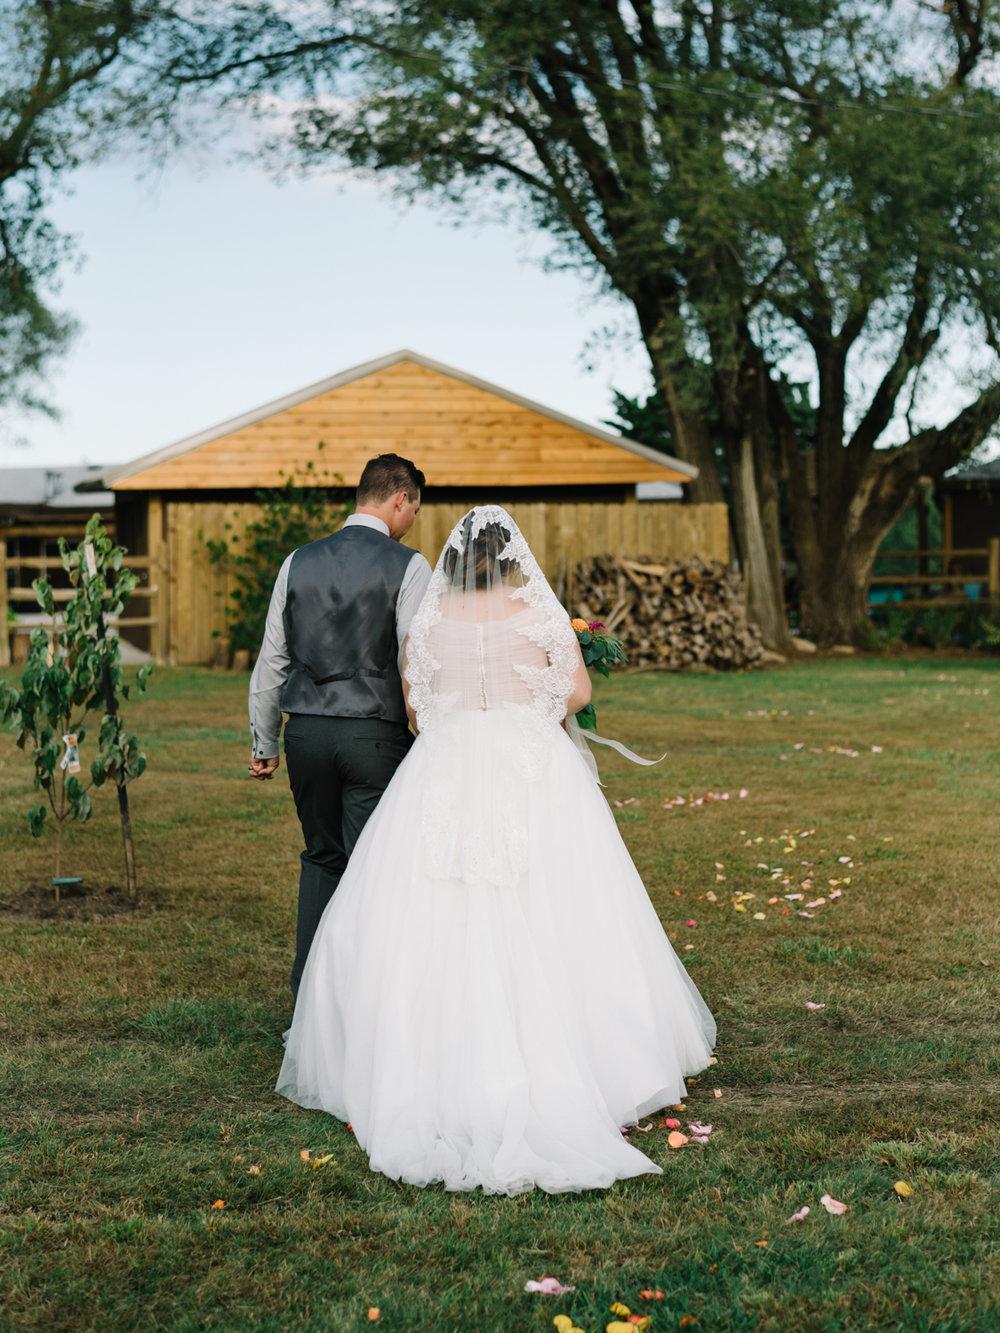 Wichita, Kansas Outdoor Wedding-Neal Dieker-Pinecrest Country Place-Wichita, Kansas Wedding Photographer-224.jpg